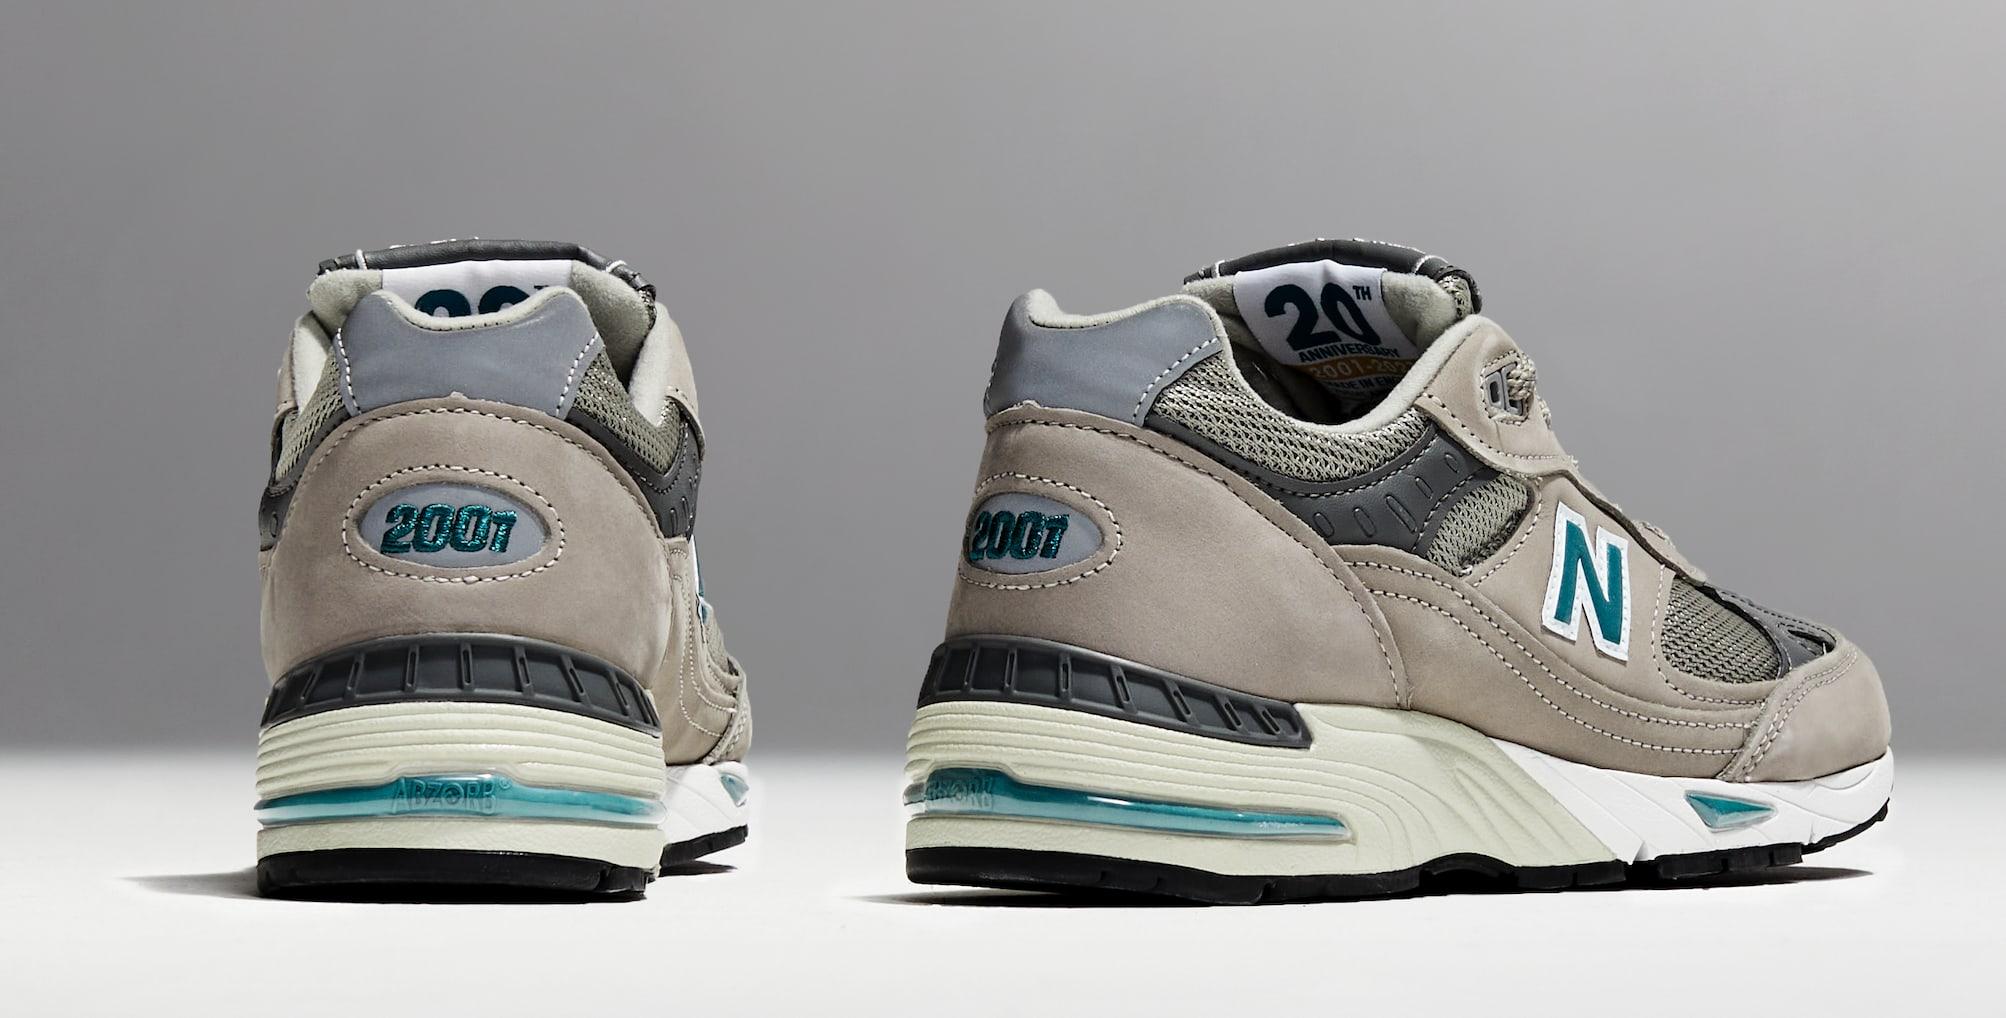 New Balance 991 '20th Anniversary' Heel